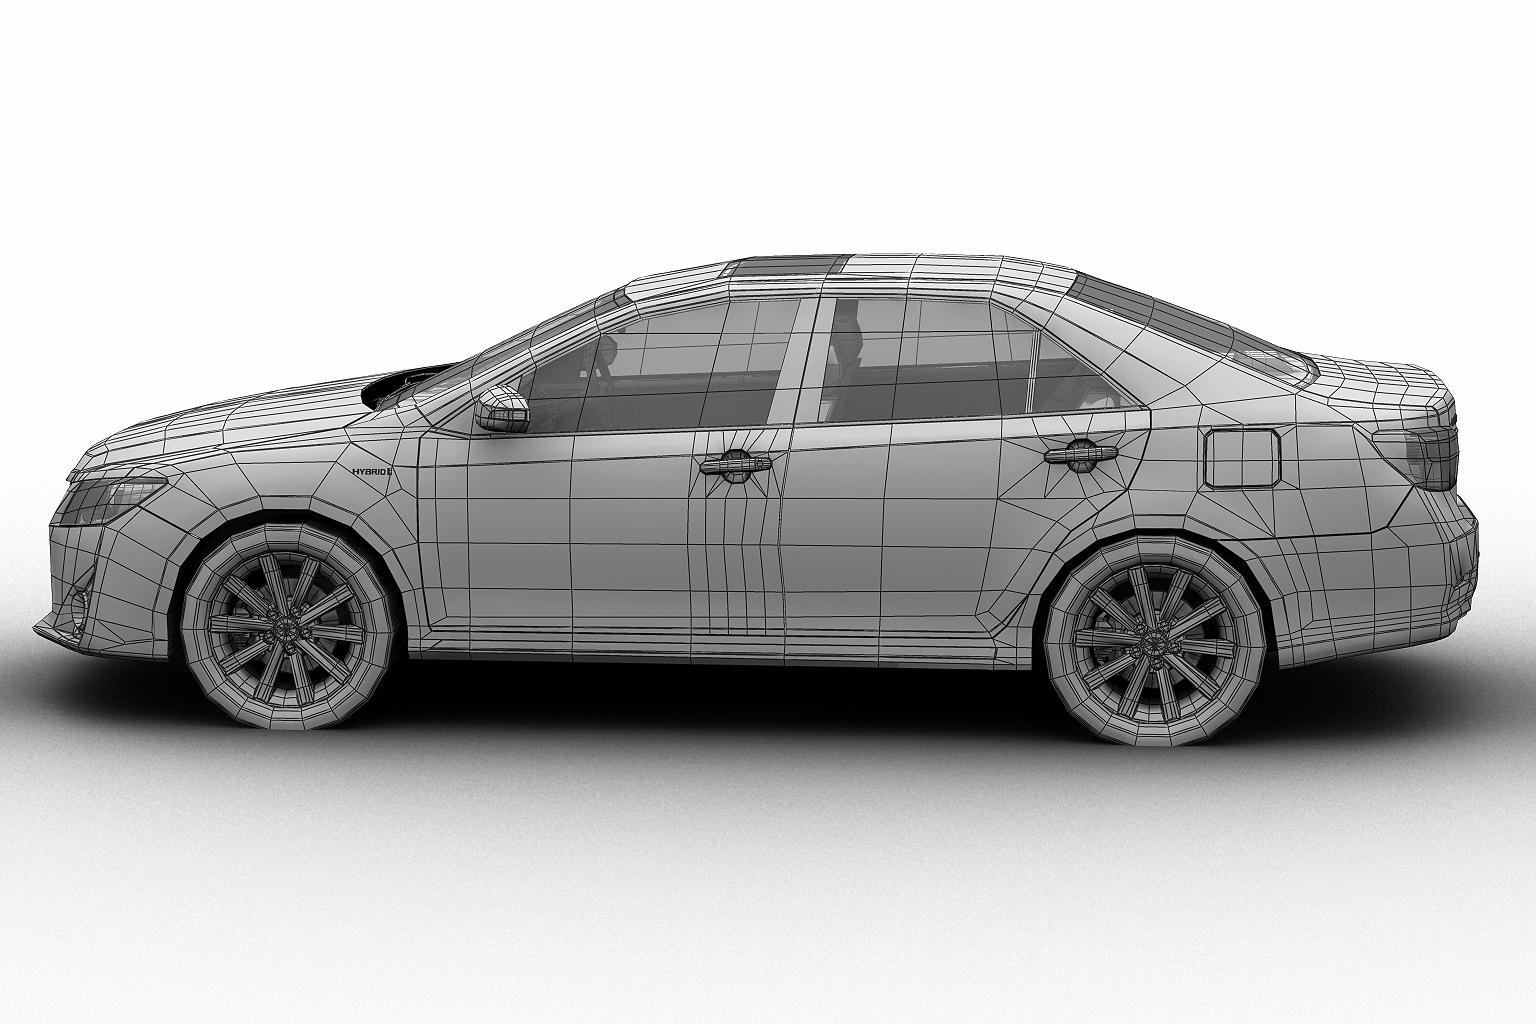 2012 toyota camry model 3d hybrid (asian) 3ds max fbx c4d lwo hrc xsi obj 136191